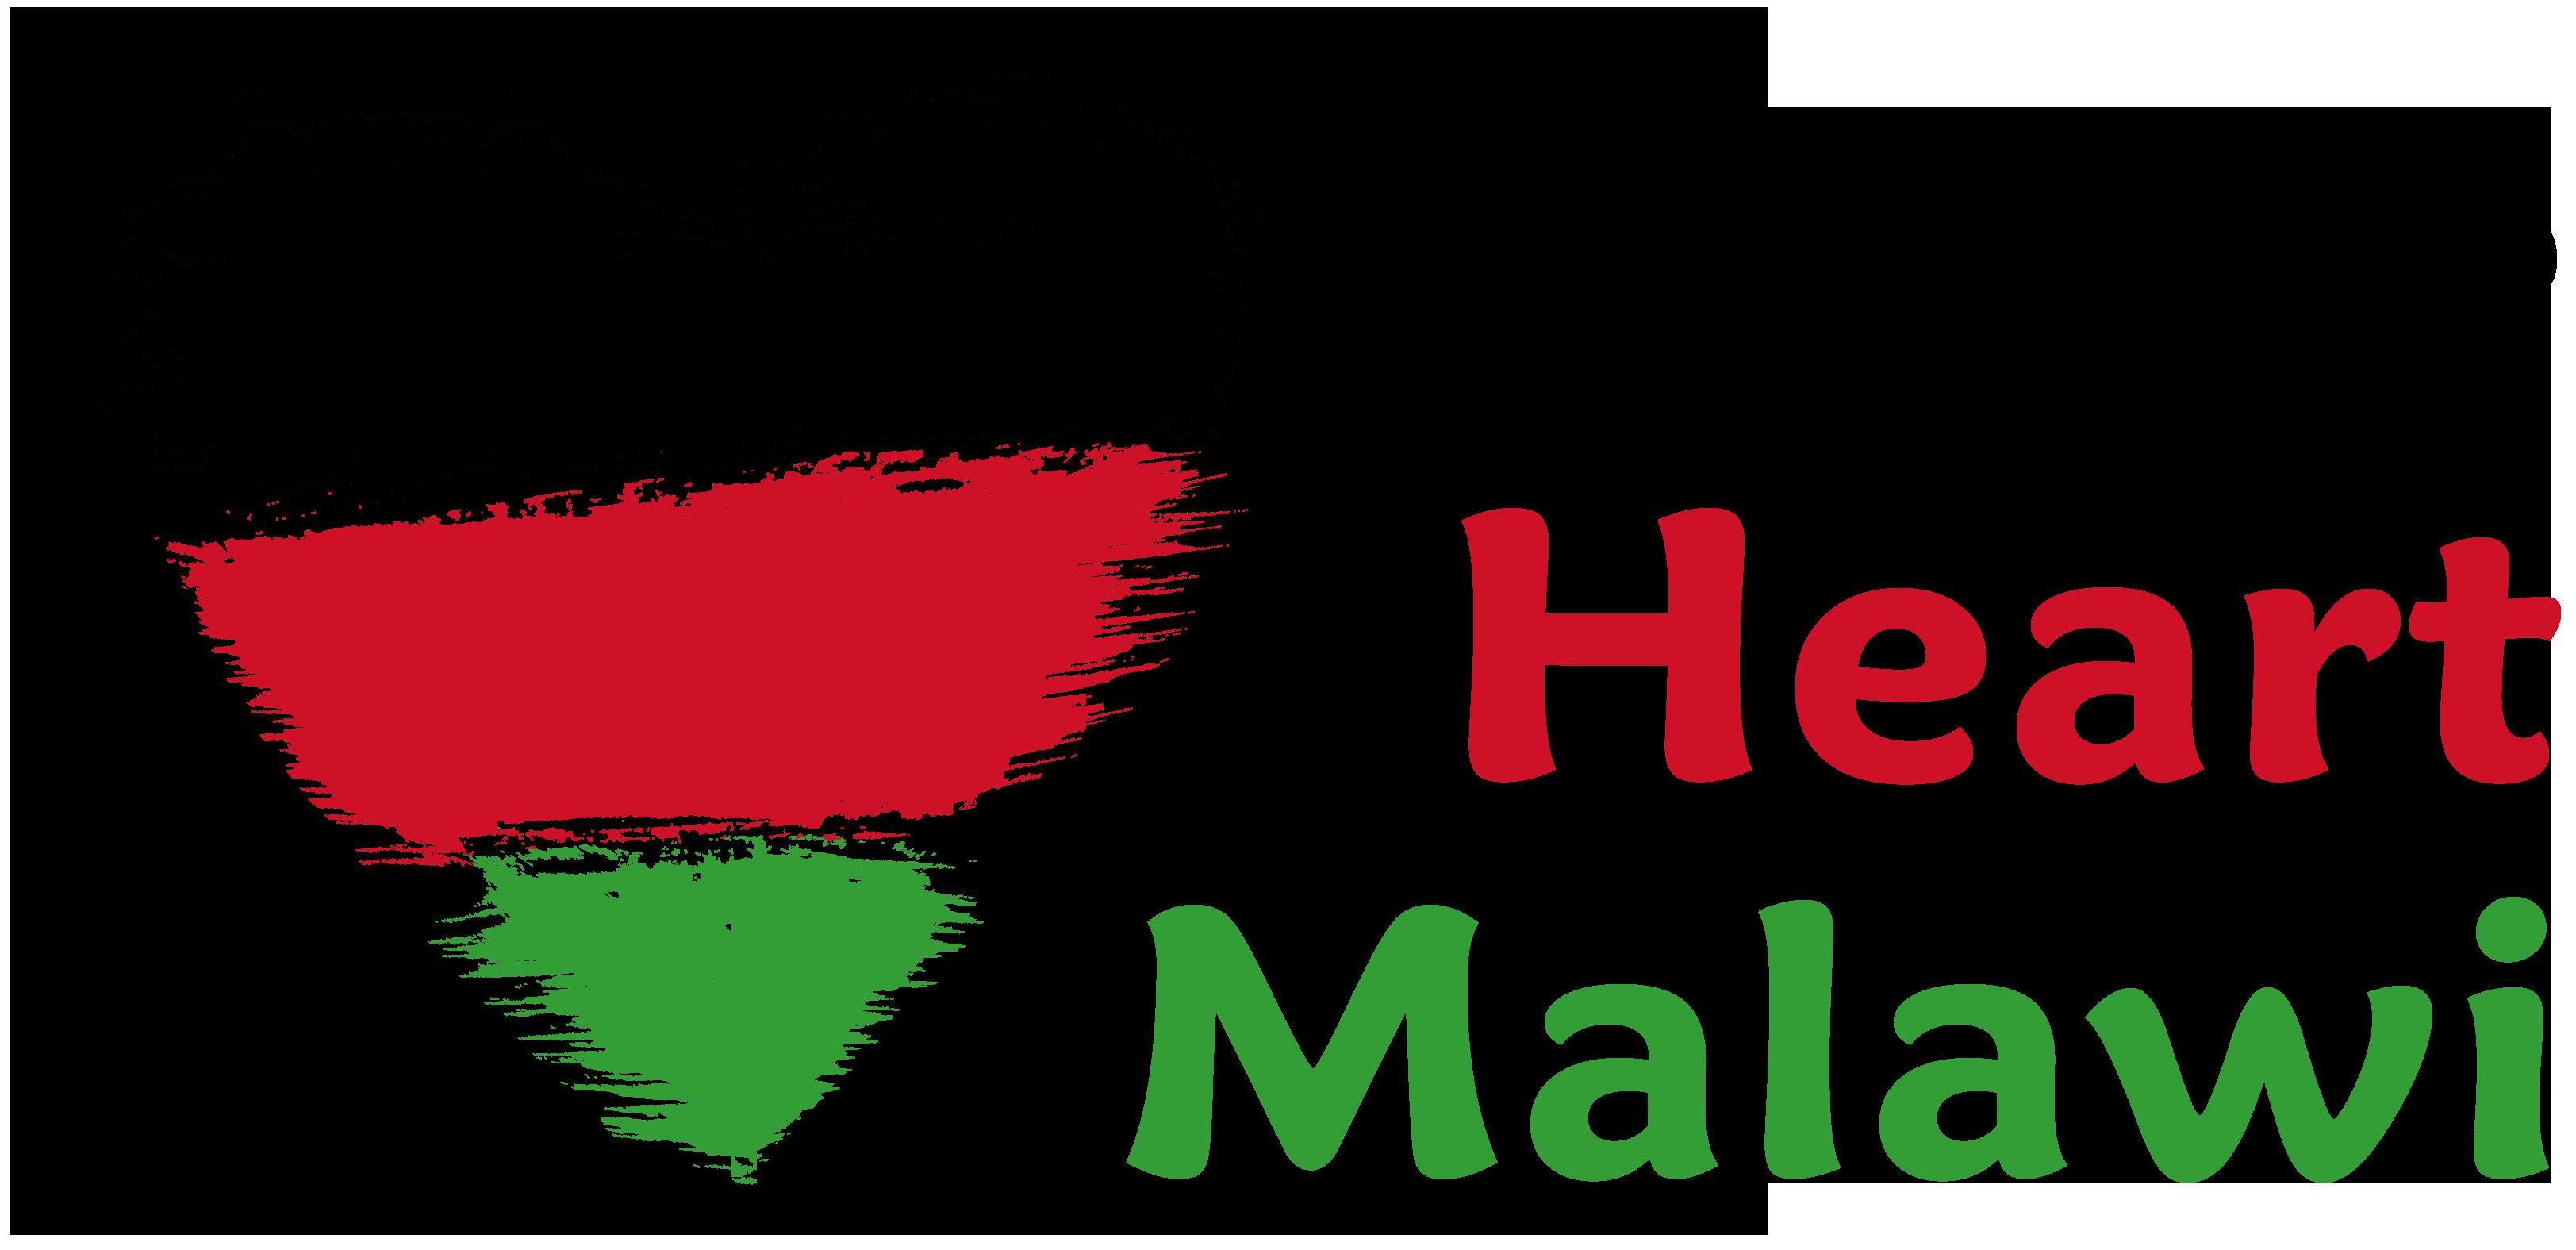 OneHeartMalawi logo